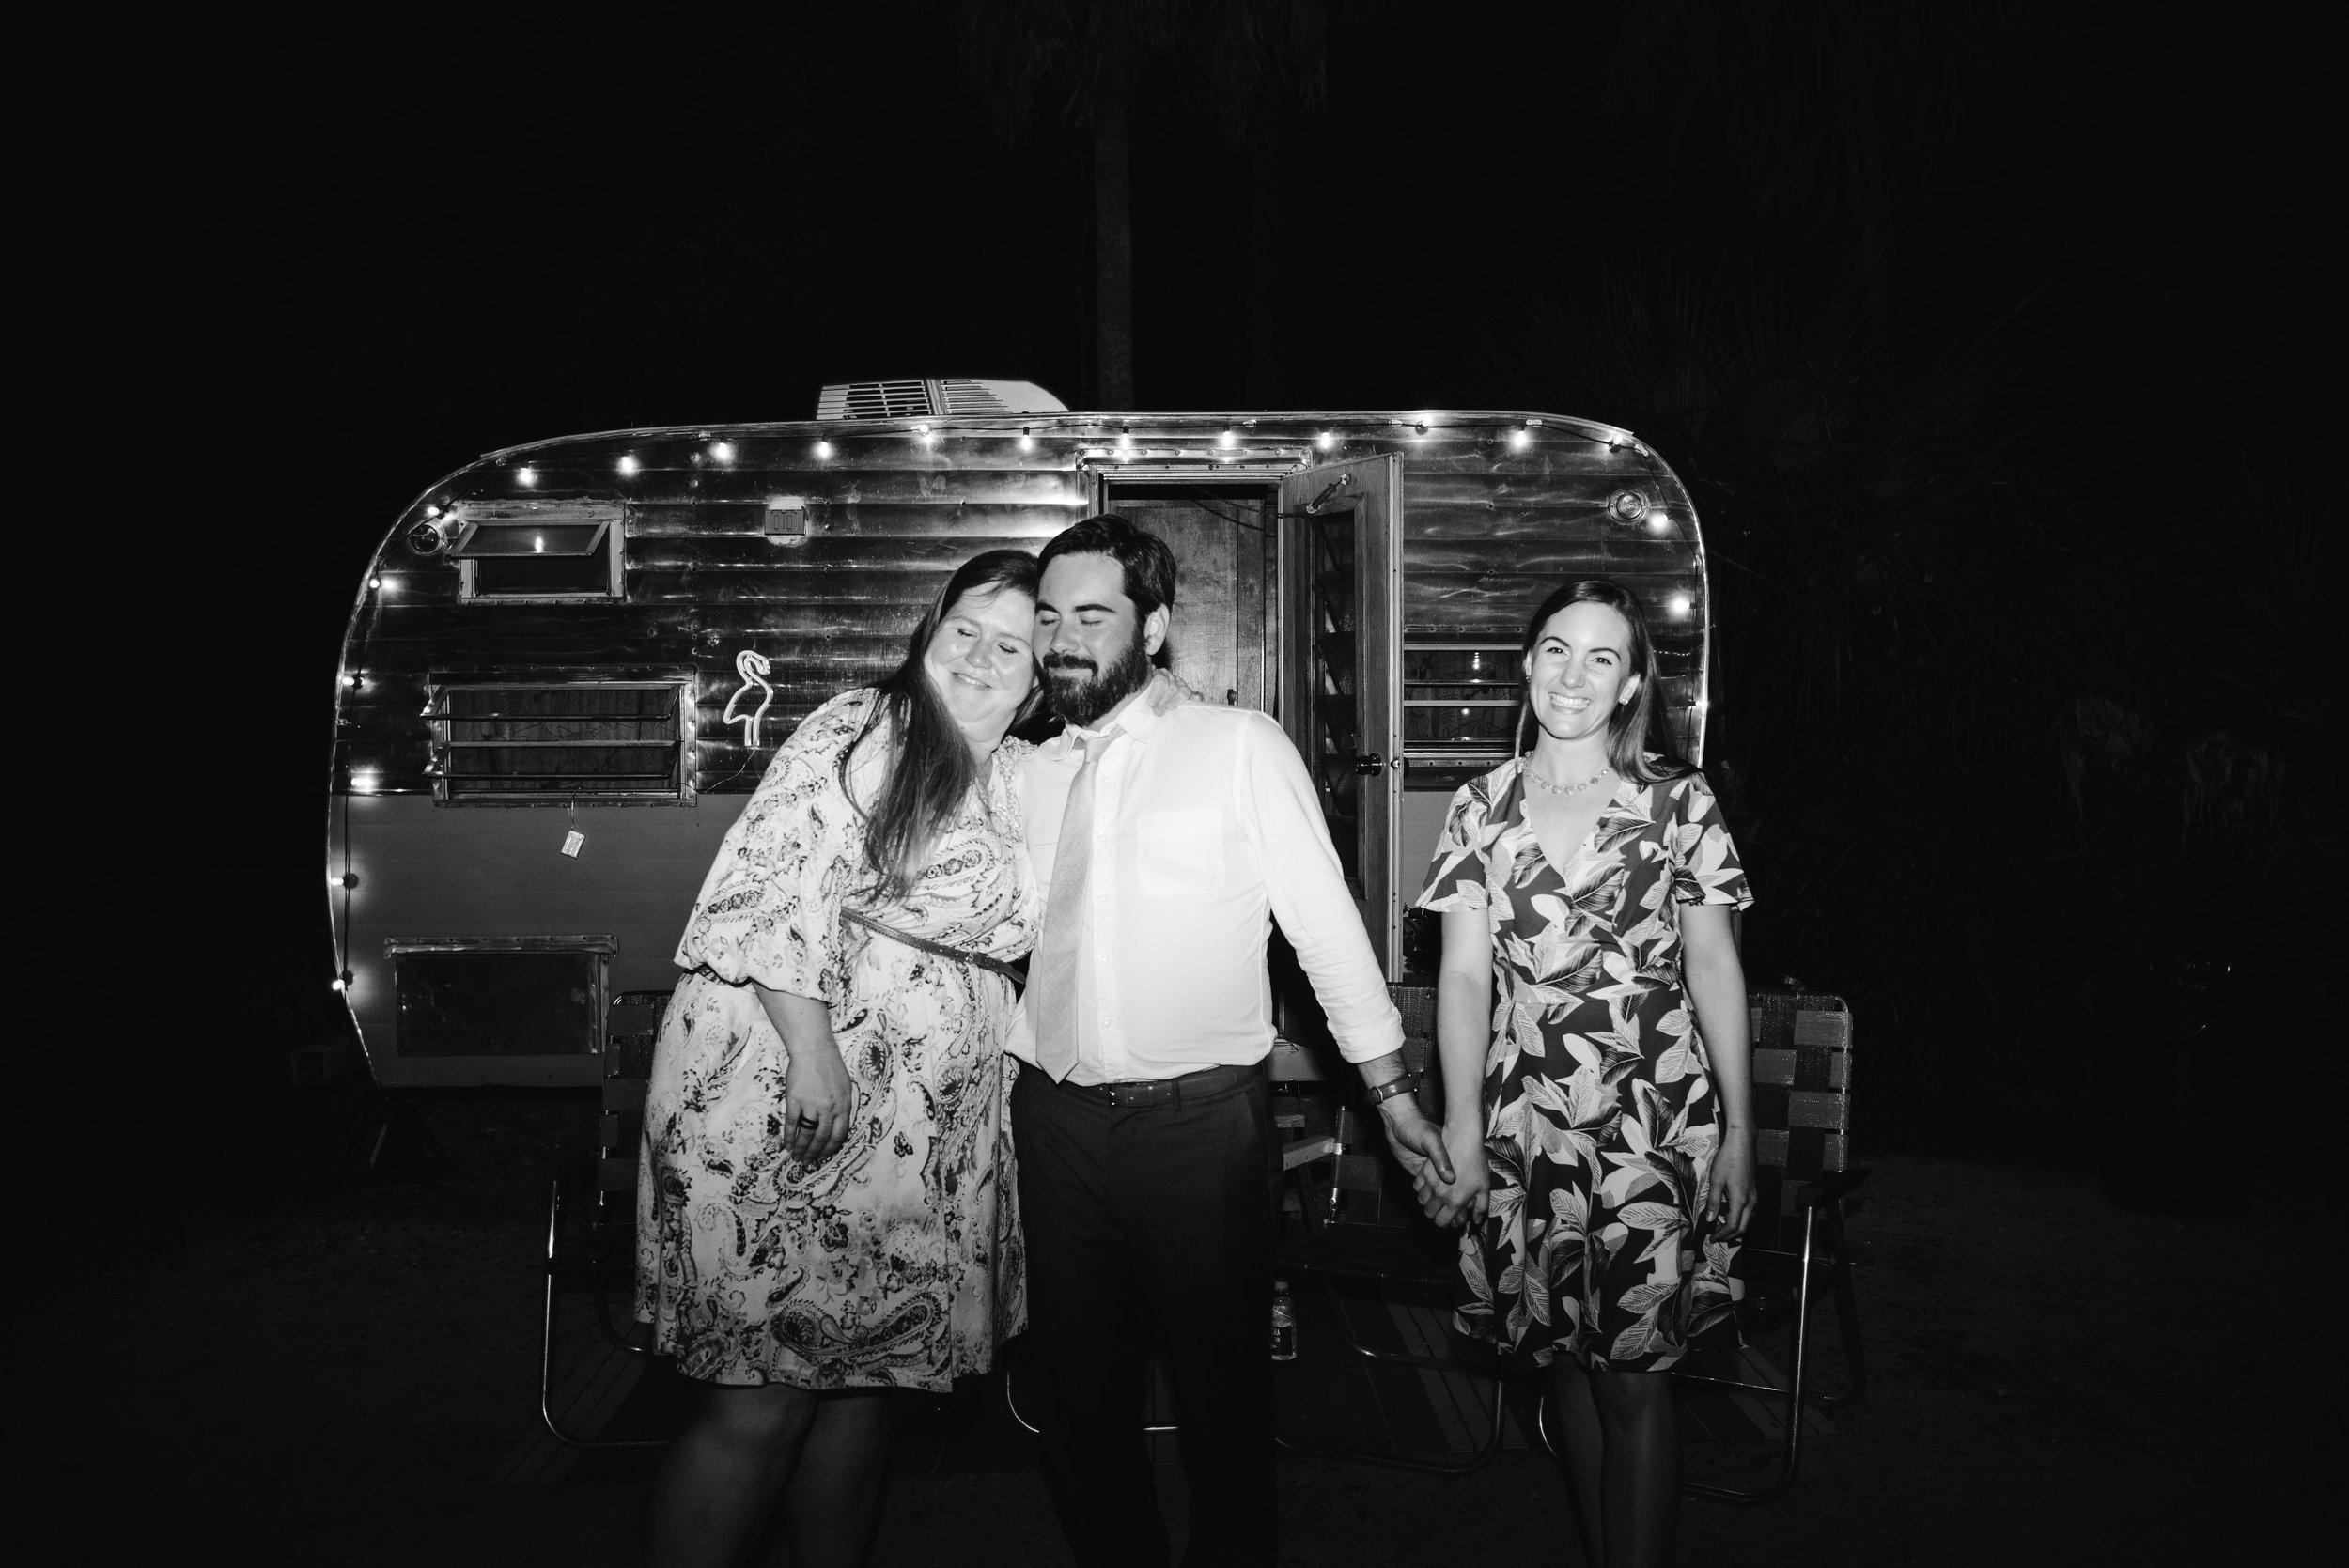 mclaughlin-wedding-1133.jpg